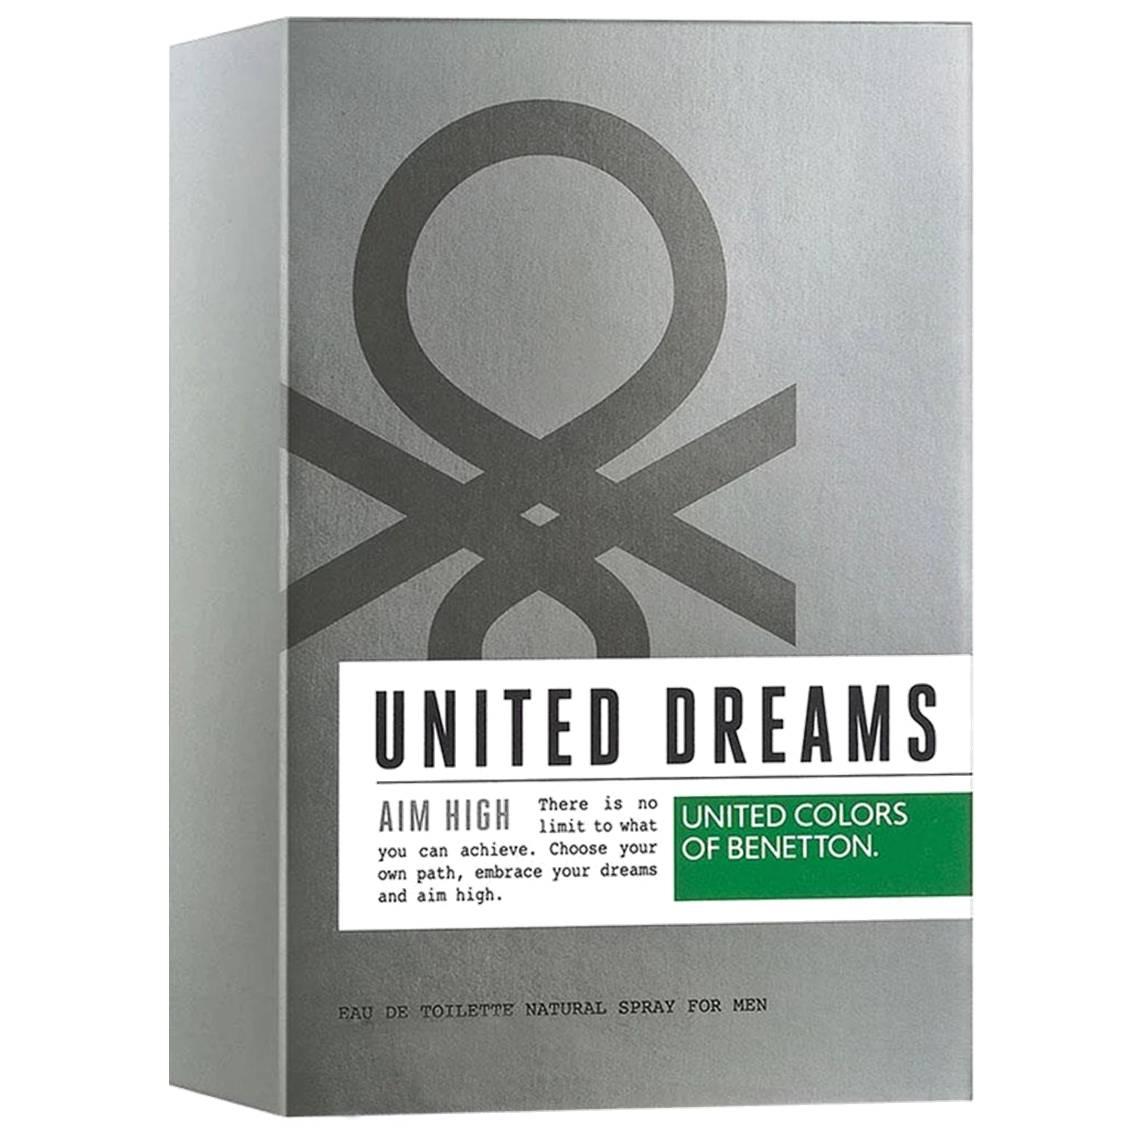 Perfume Masculino Importado - United Dreams Aim High Benetton Eau de Toilette 100 ml